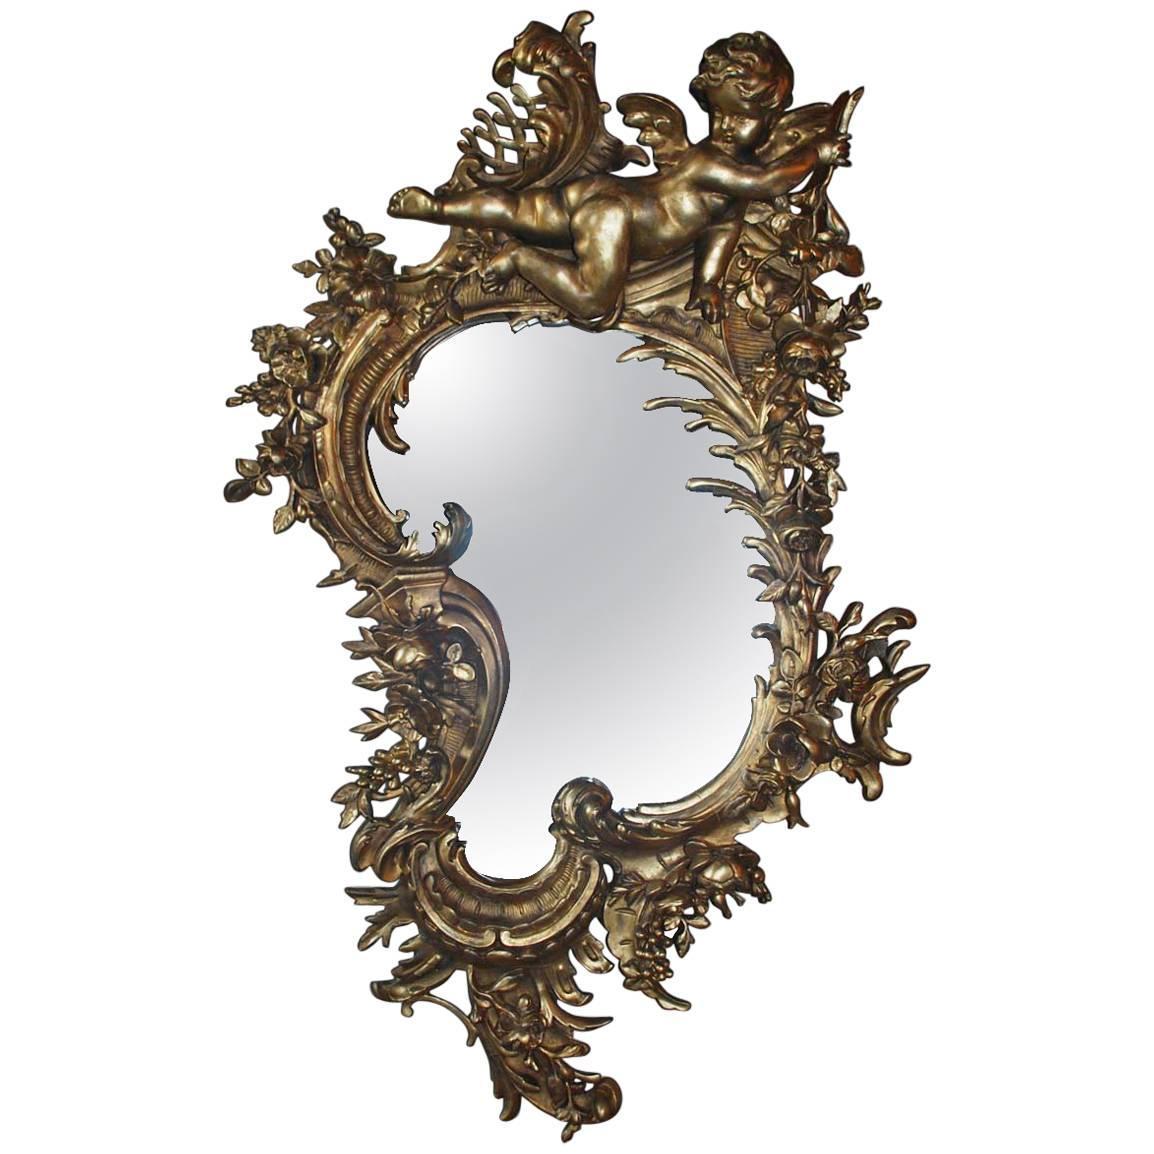 Antique 19th century Italian gold rococo wall mirror with large cherub or putti